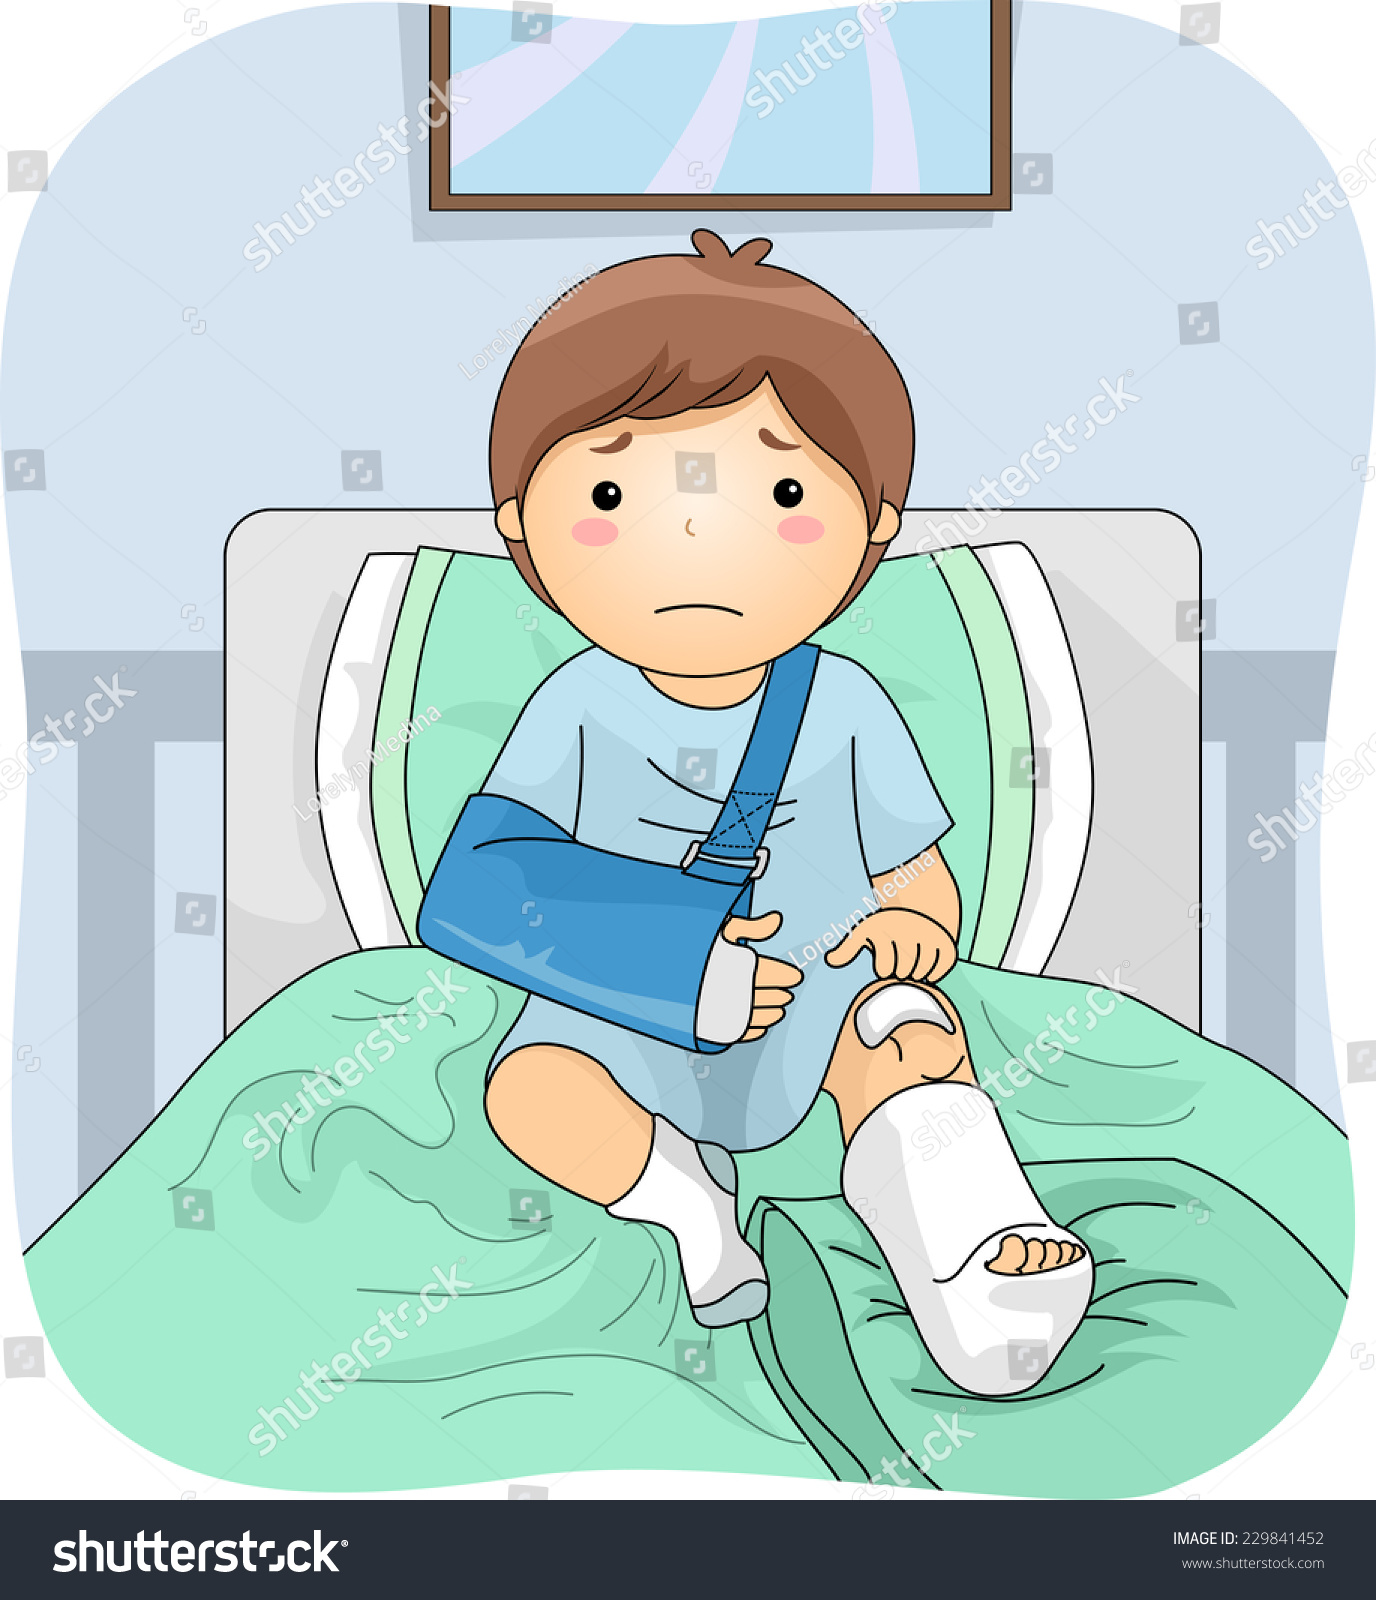 illustration featuring injured boy wearing leg stock vector (royalty